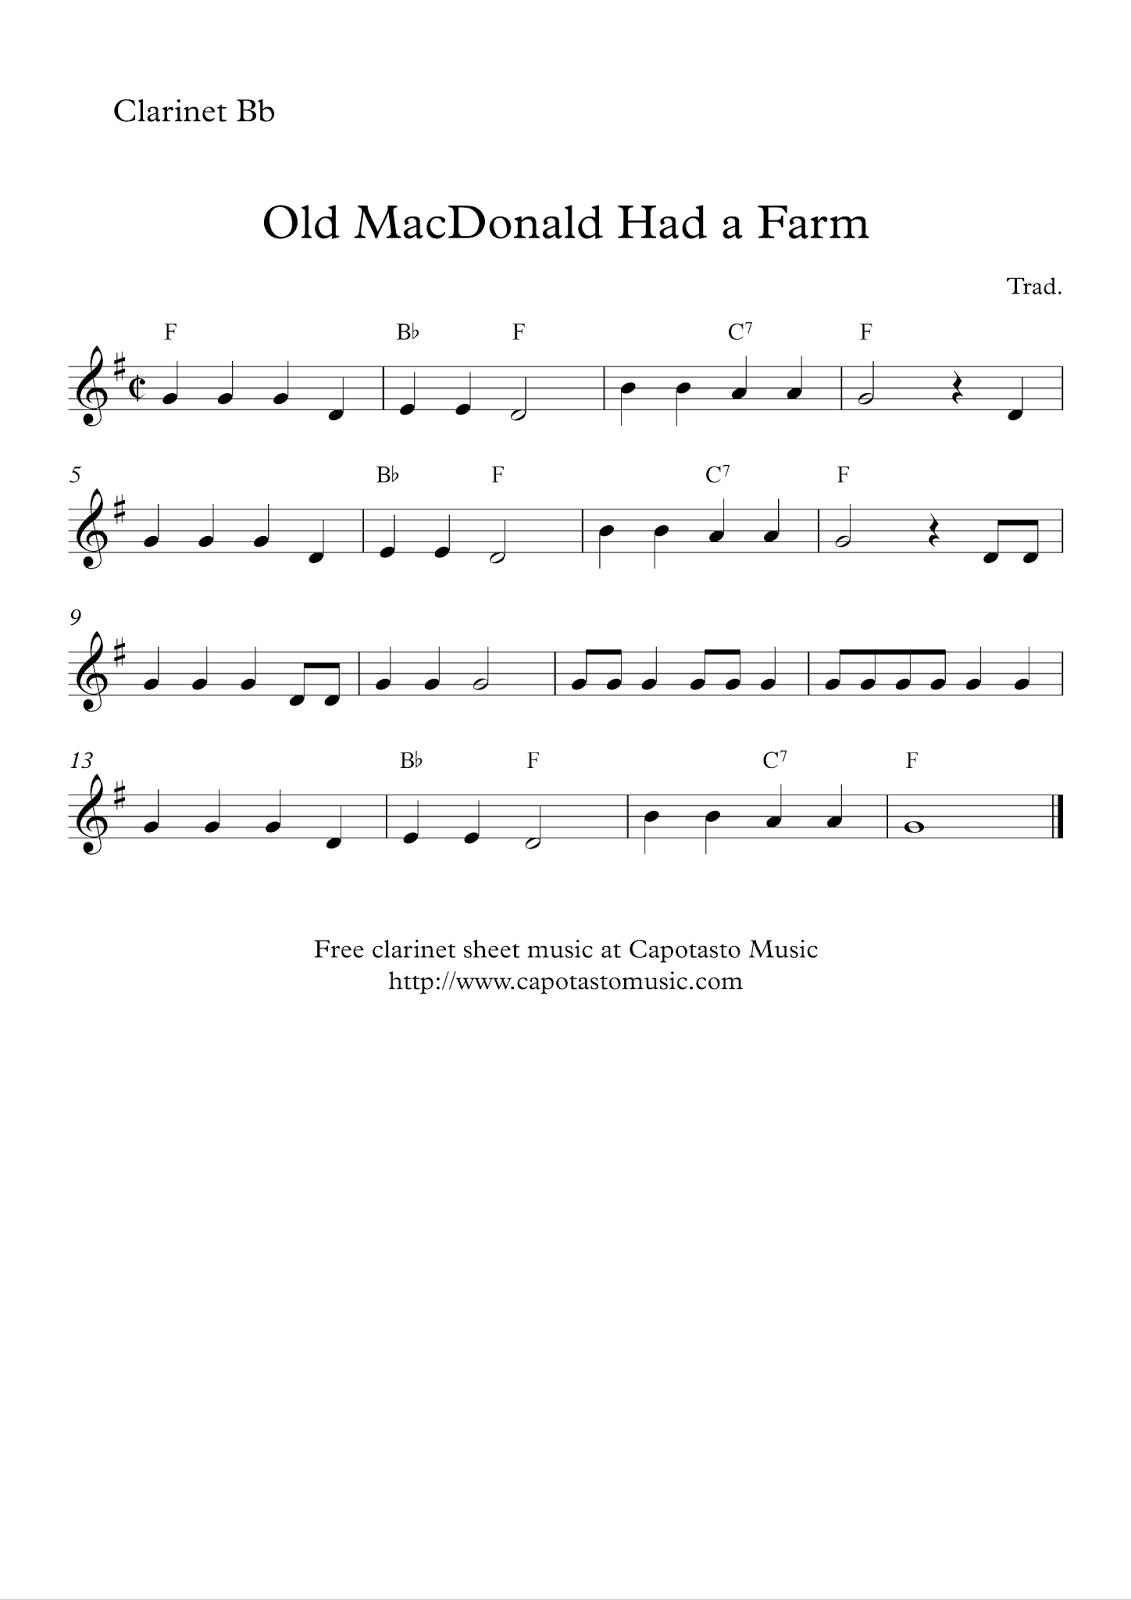 Free Printable Sheet Music Free Easy Clarinet Sheet Music Old Macdonald Had A Farm